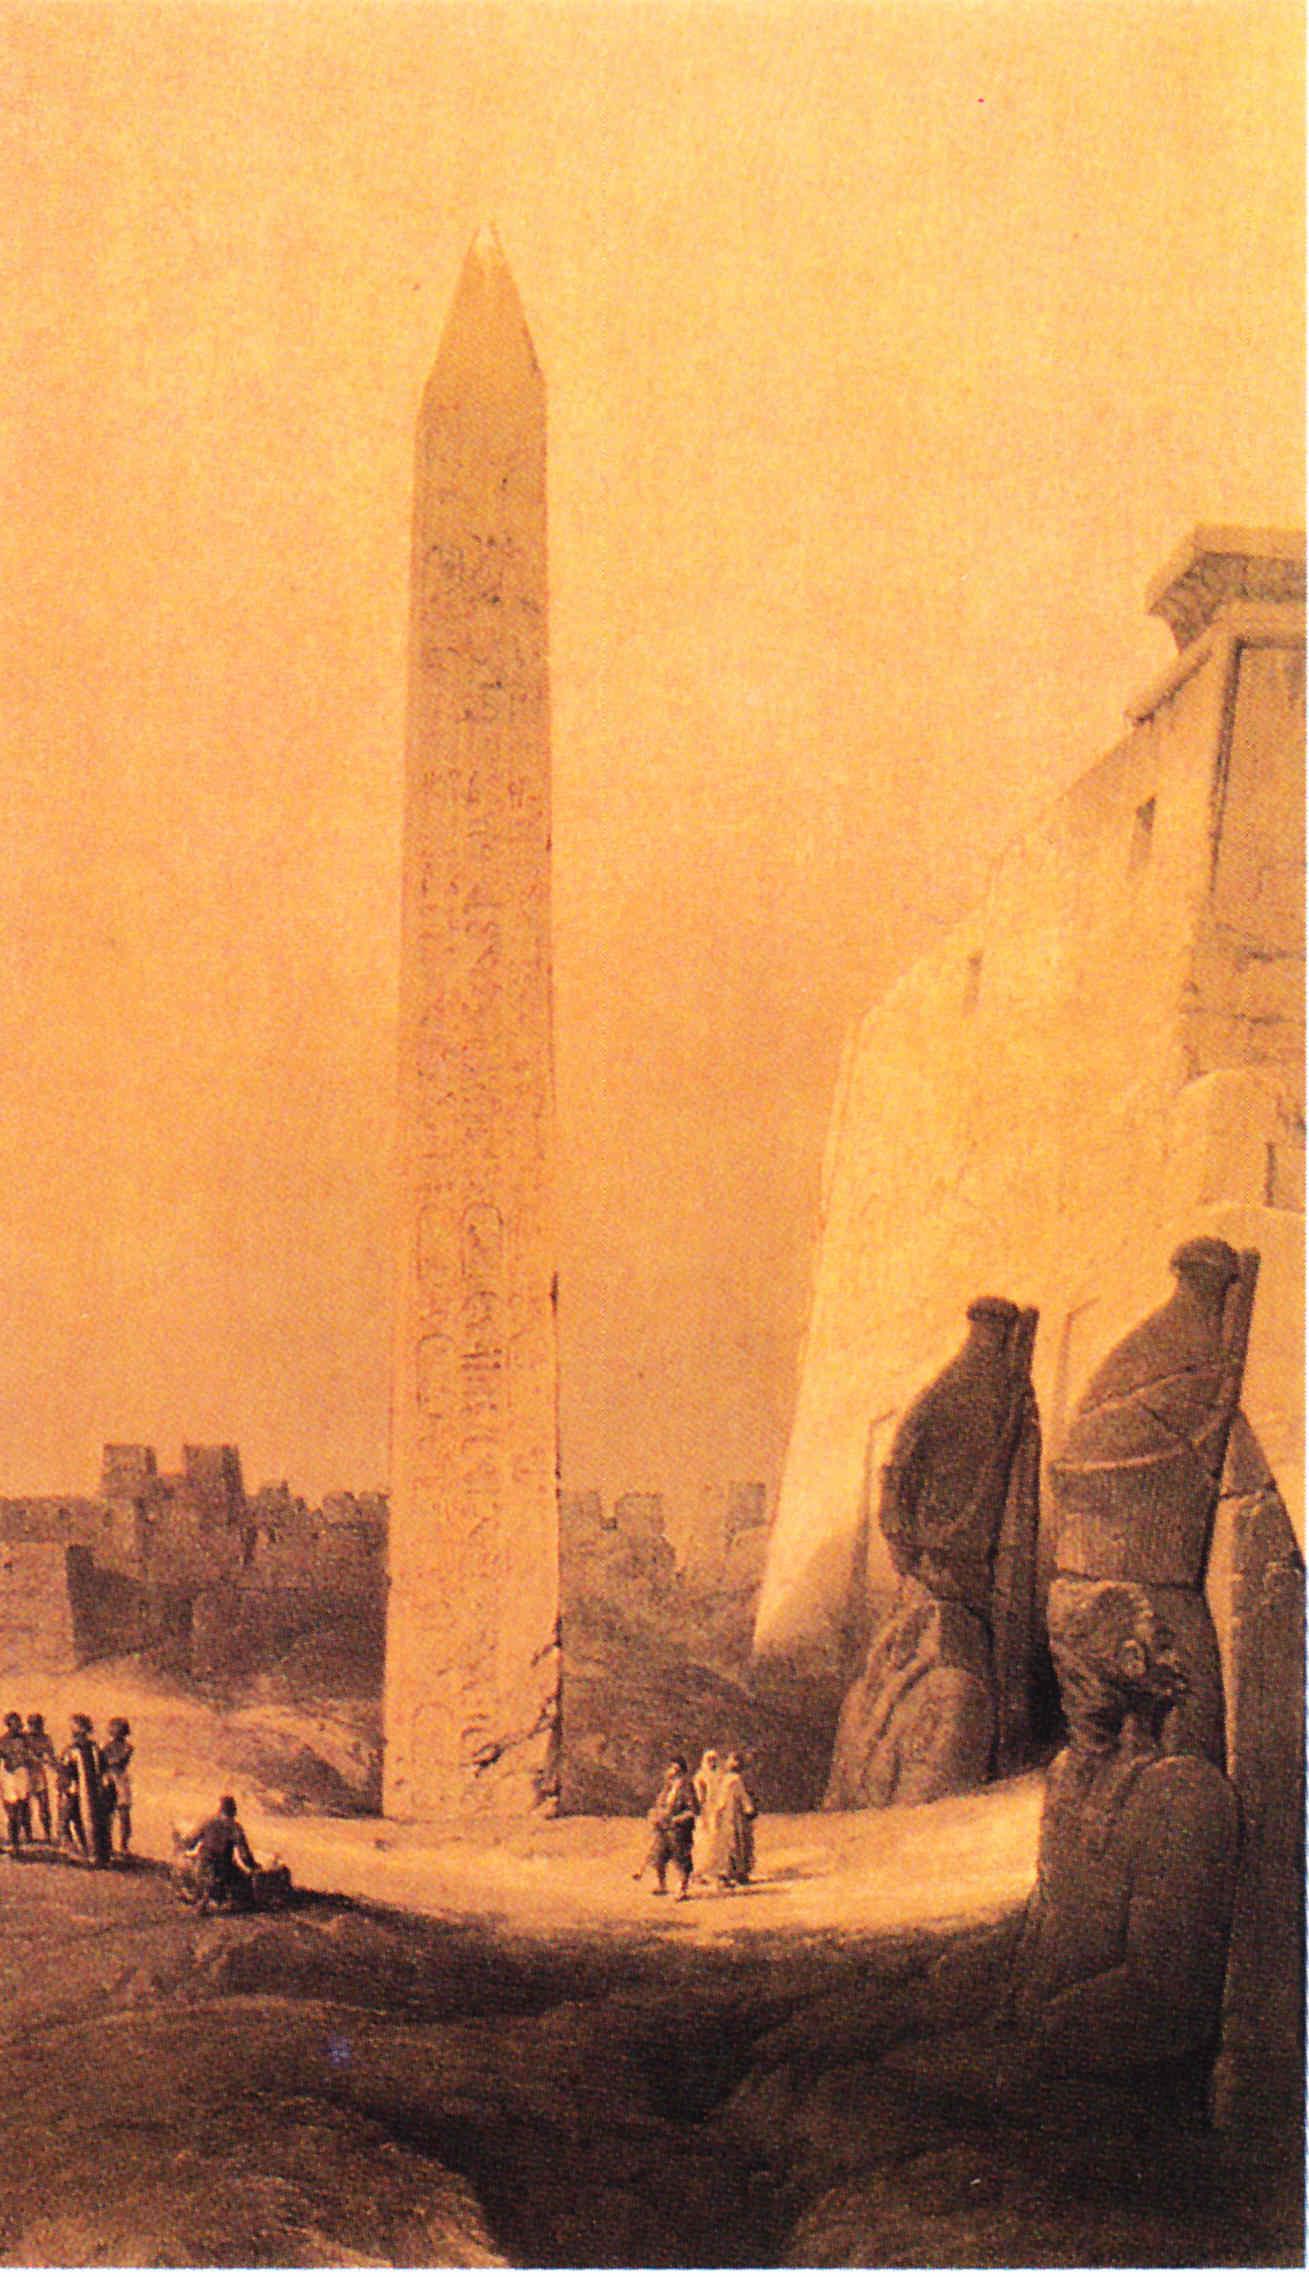 Egipto Antiguo 44 y Ptolomeo VIII Evergetes 3